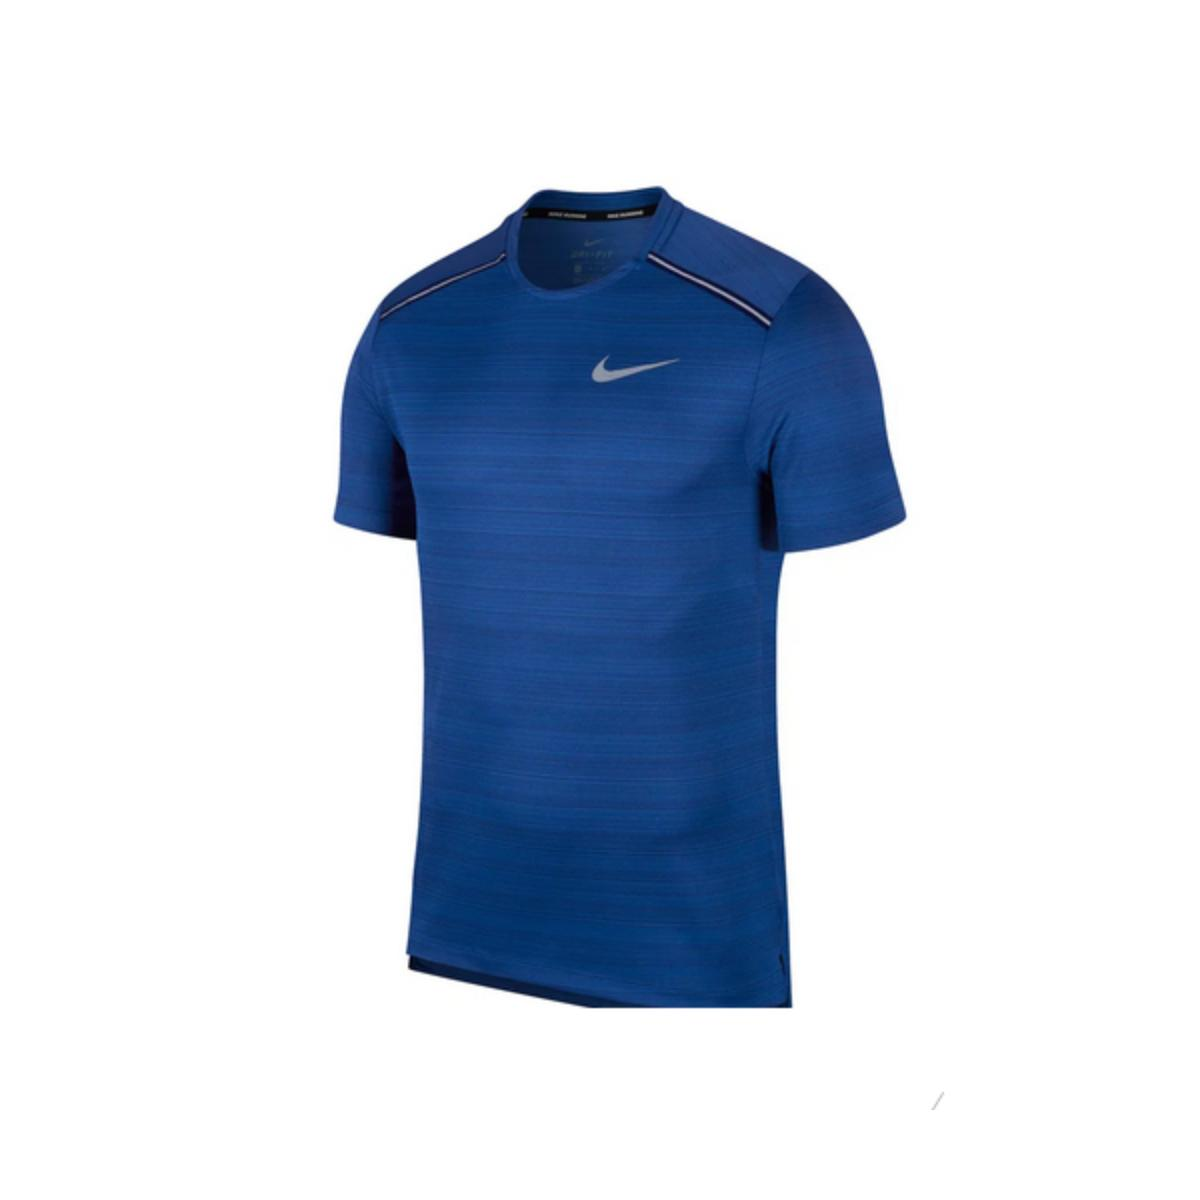 Camiseta Masculina Nike Aj7565-438 Dri-fit Miler Royal